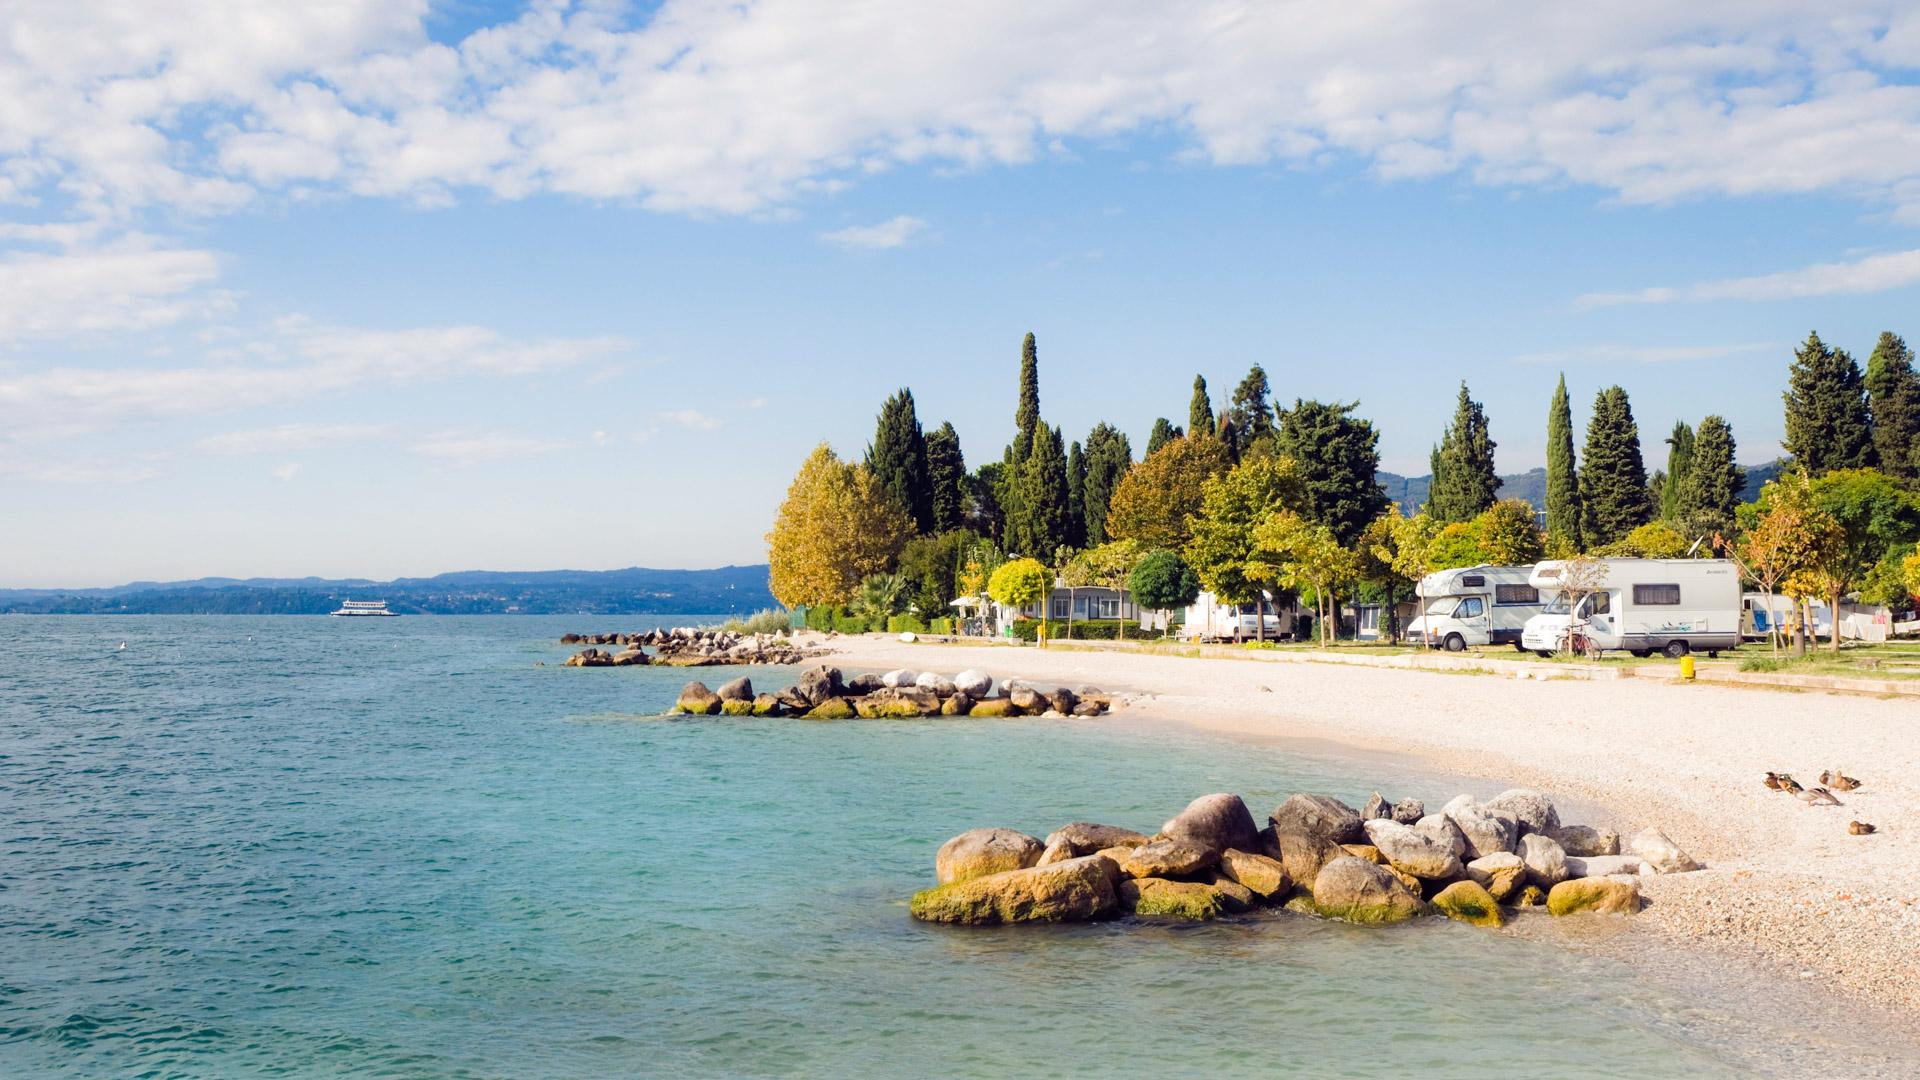 Mobilheim Mieten Italien Adria : Startseite italien italiareisen ferien urlaub reisen in